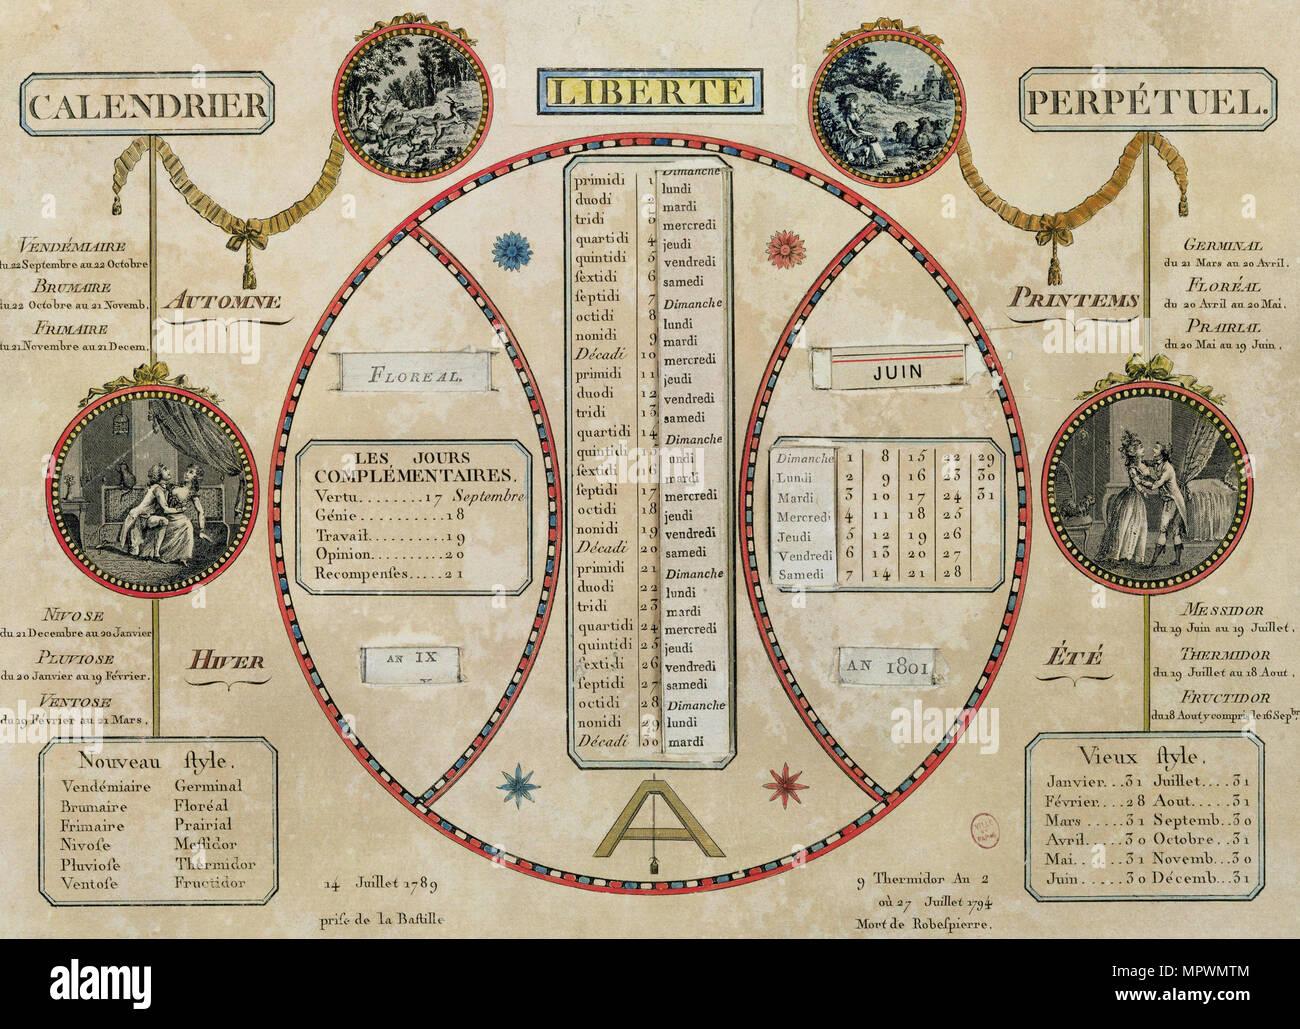 French Revolutionary Calendar 1801 Stock Photo 186191284 Alamy